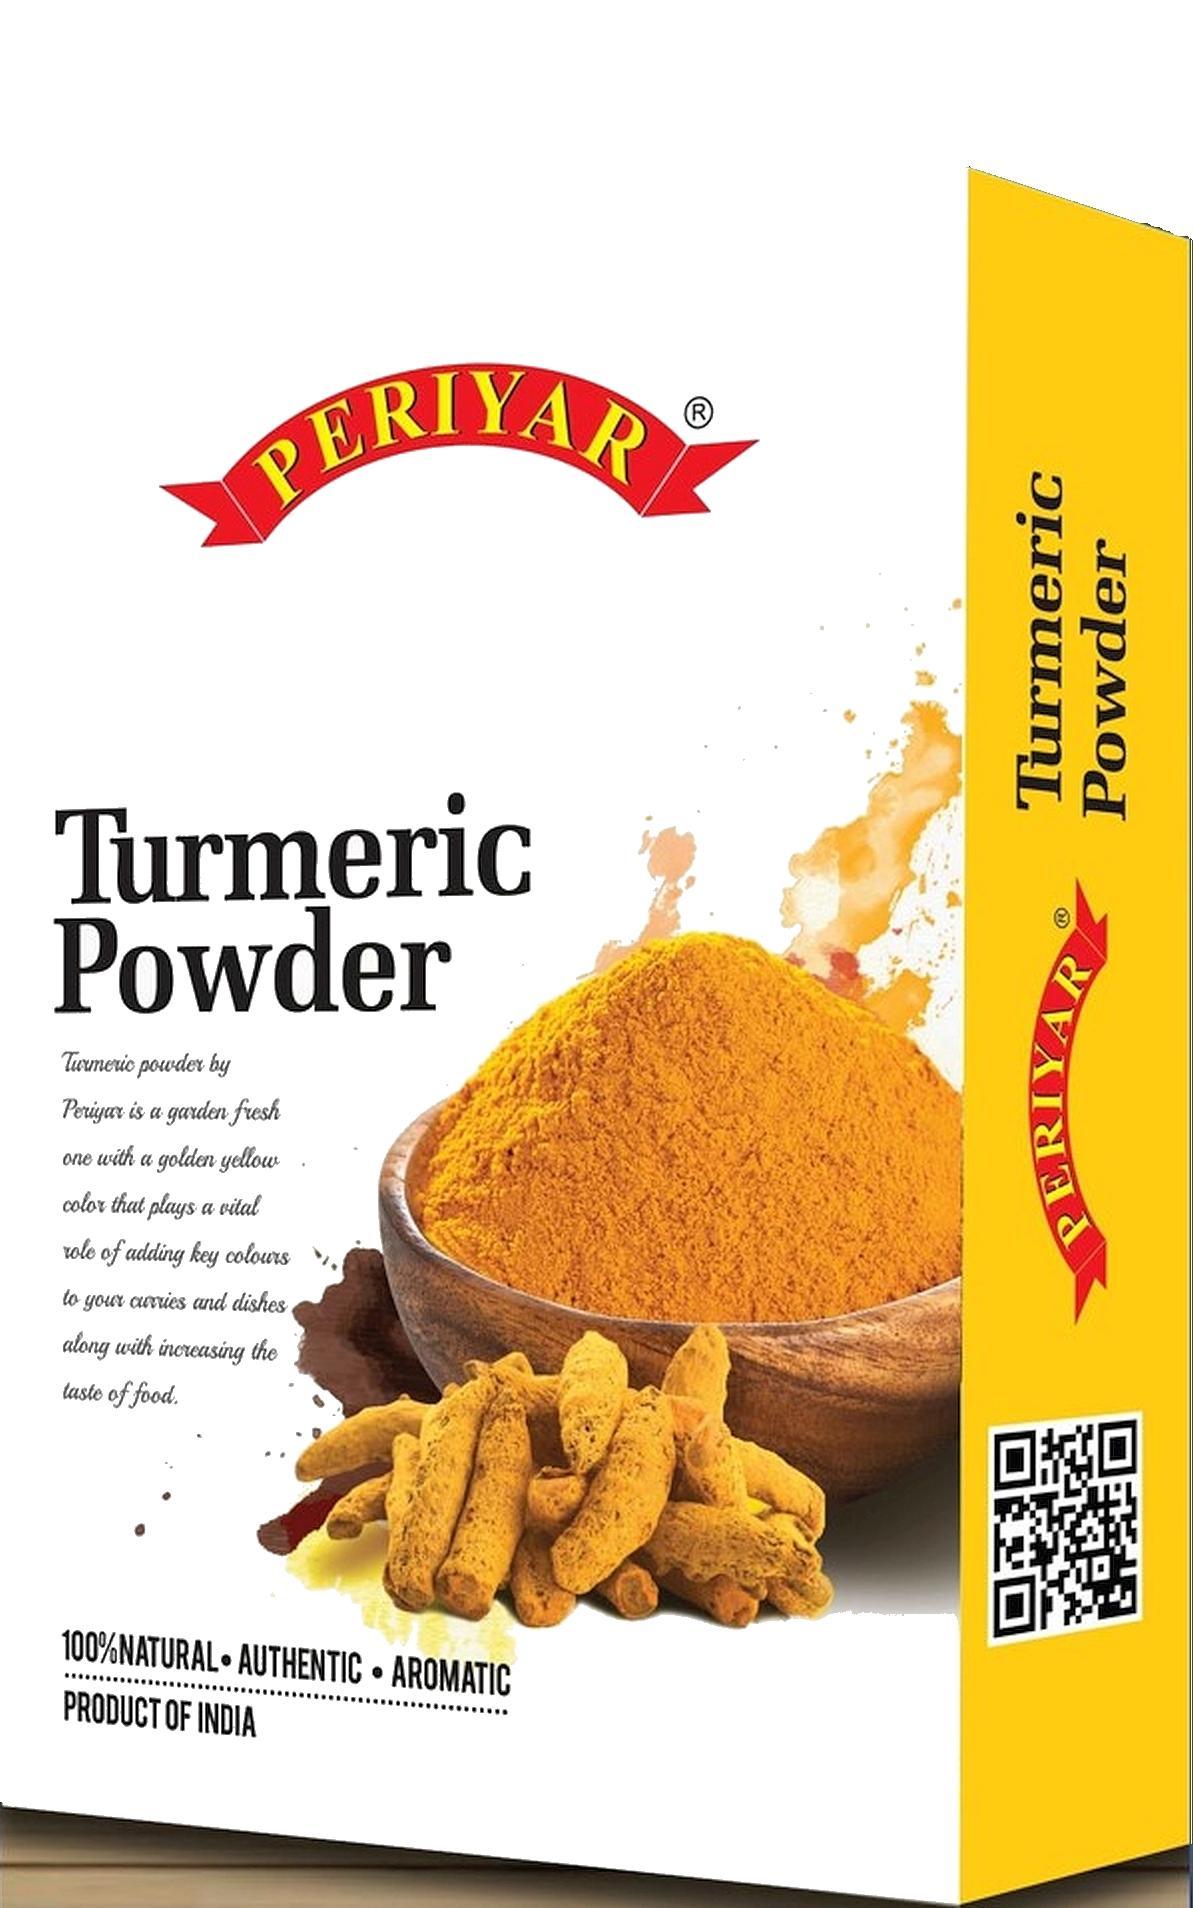 Periyar Turmeric Powder